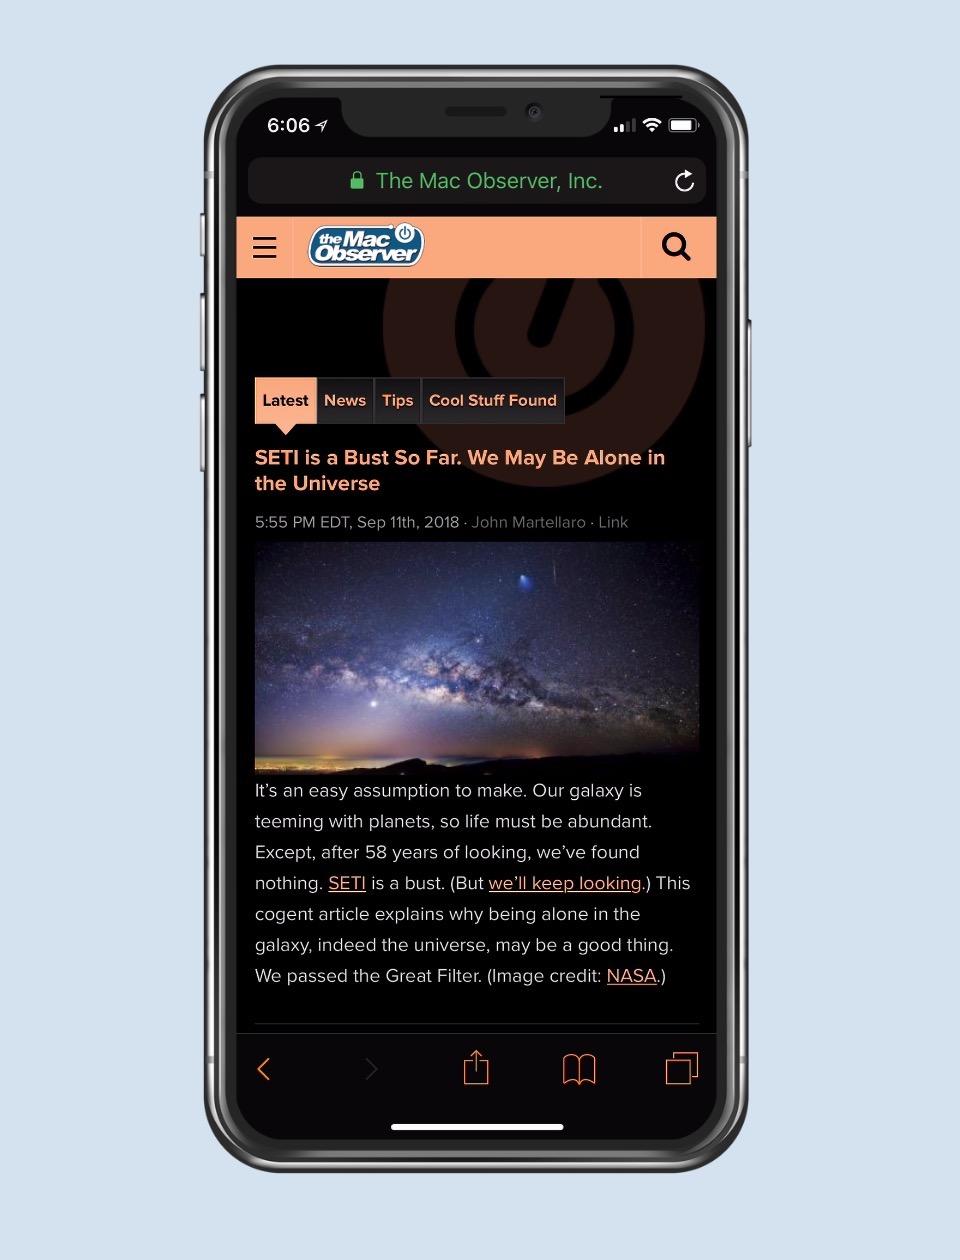 Smart Invert in Safari on iPhone